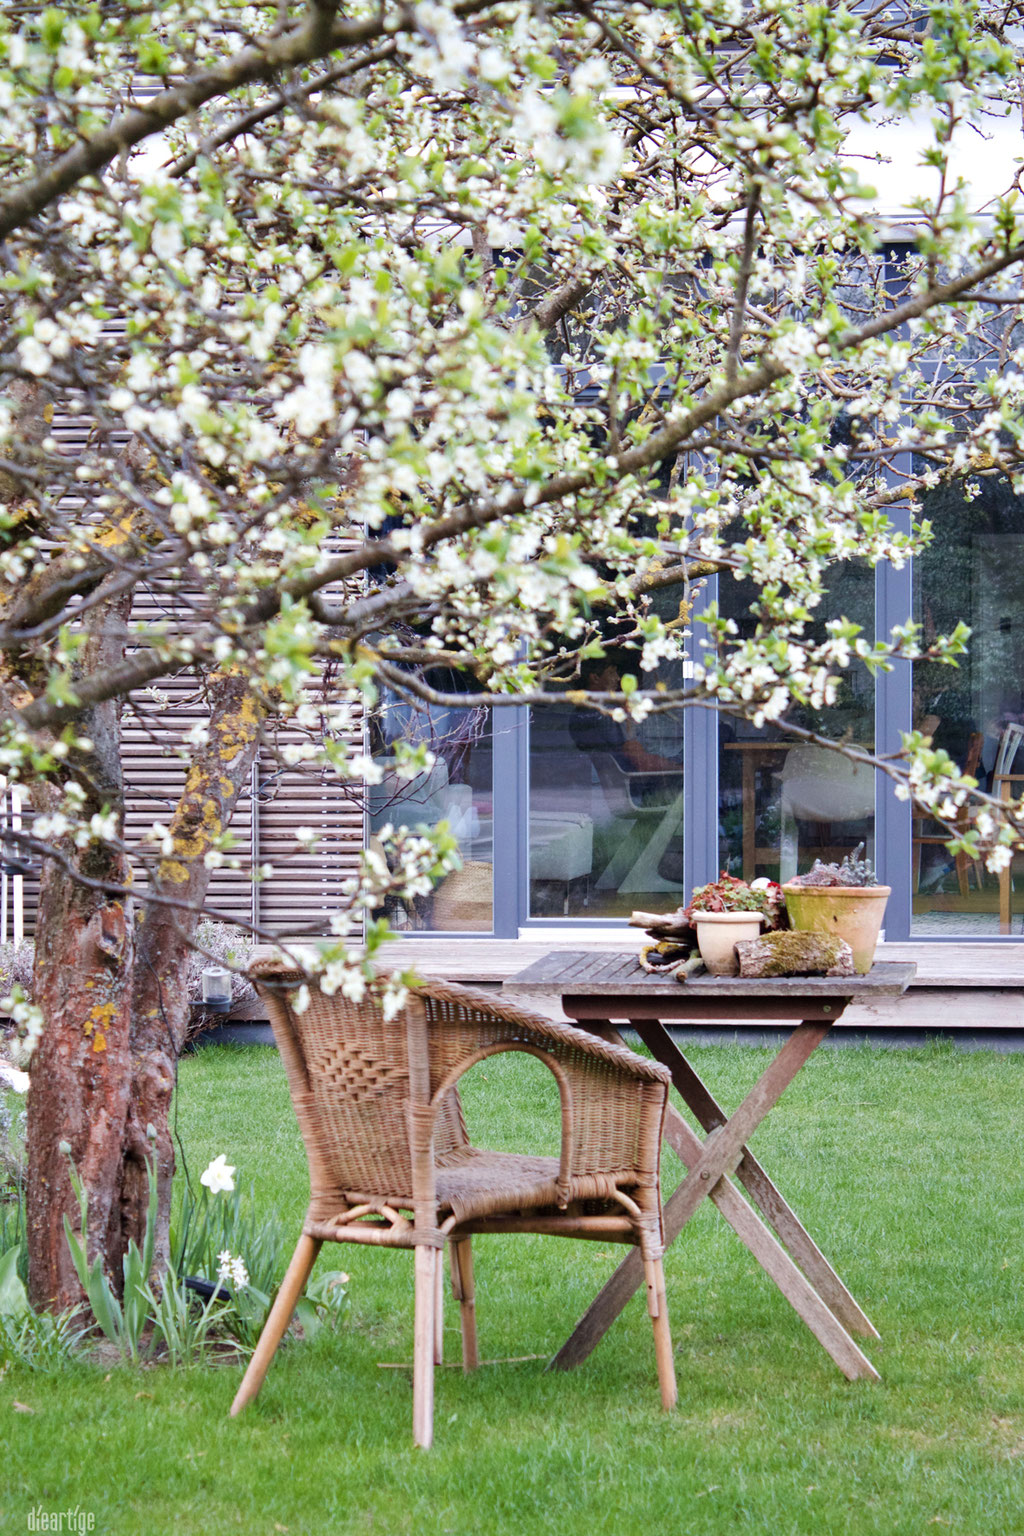 dieartigeGARTEN - Pflaumenblüte + Sitzplatz